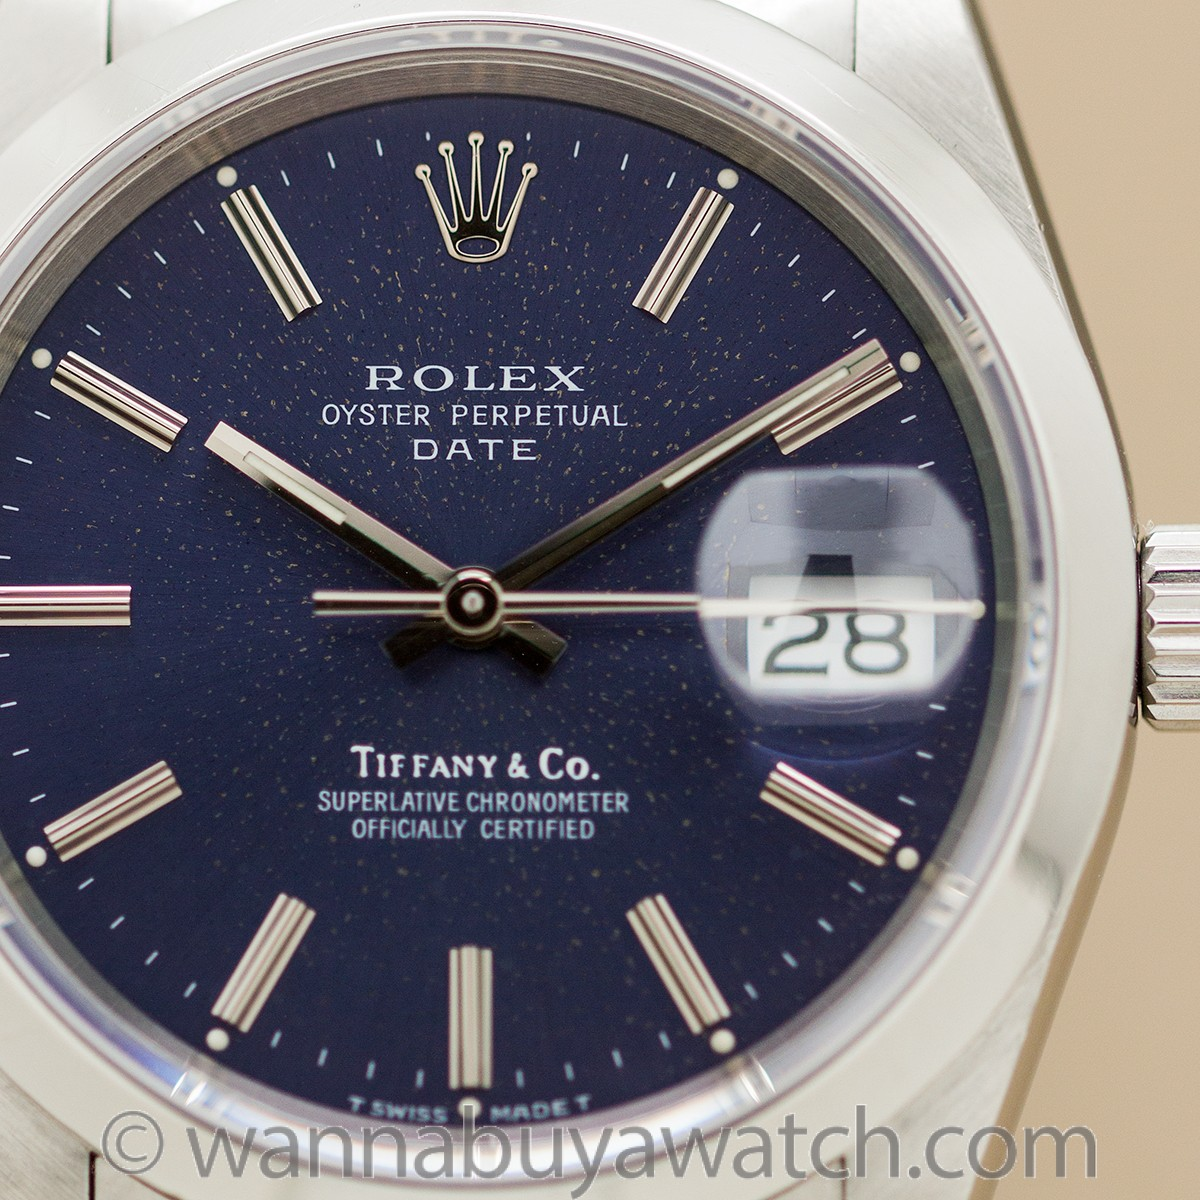 Rolex Oyster Perpetual Date ref 15200 Tiffany & Co circa 1990